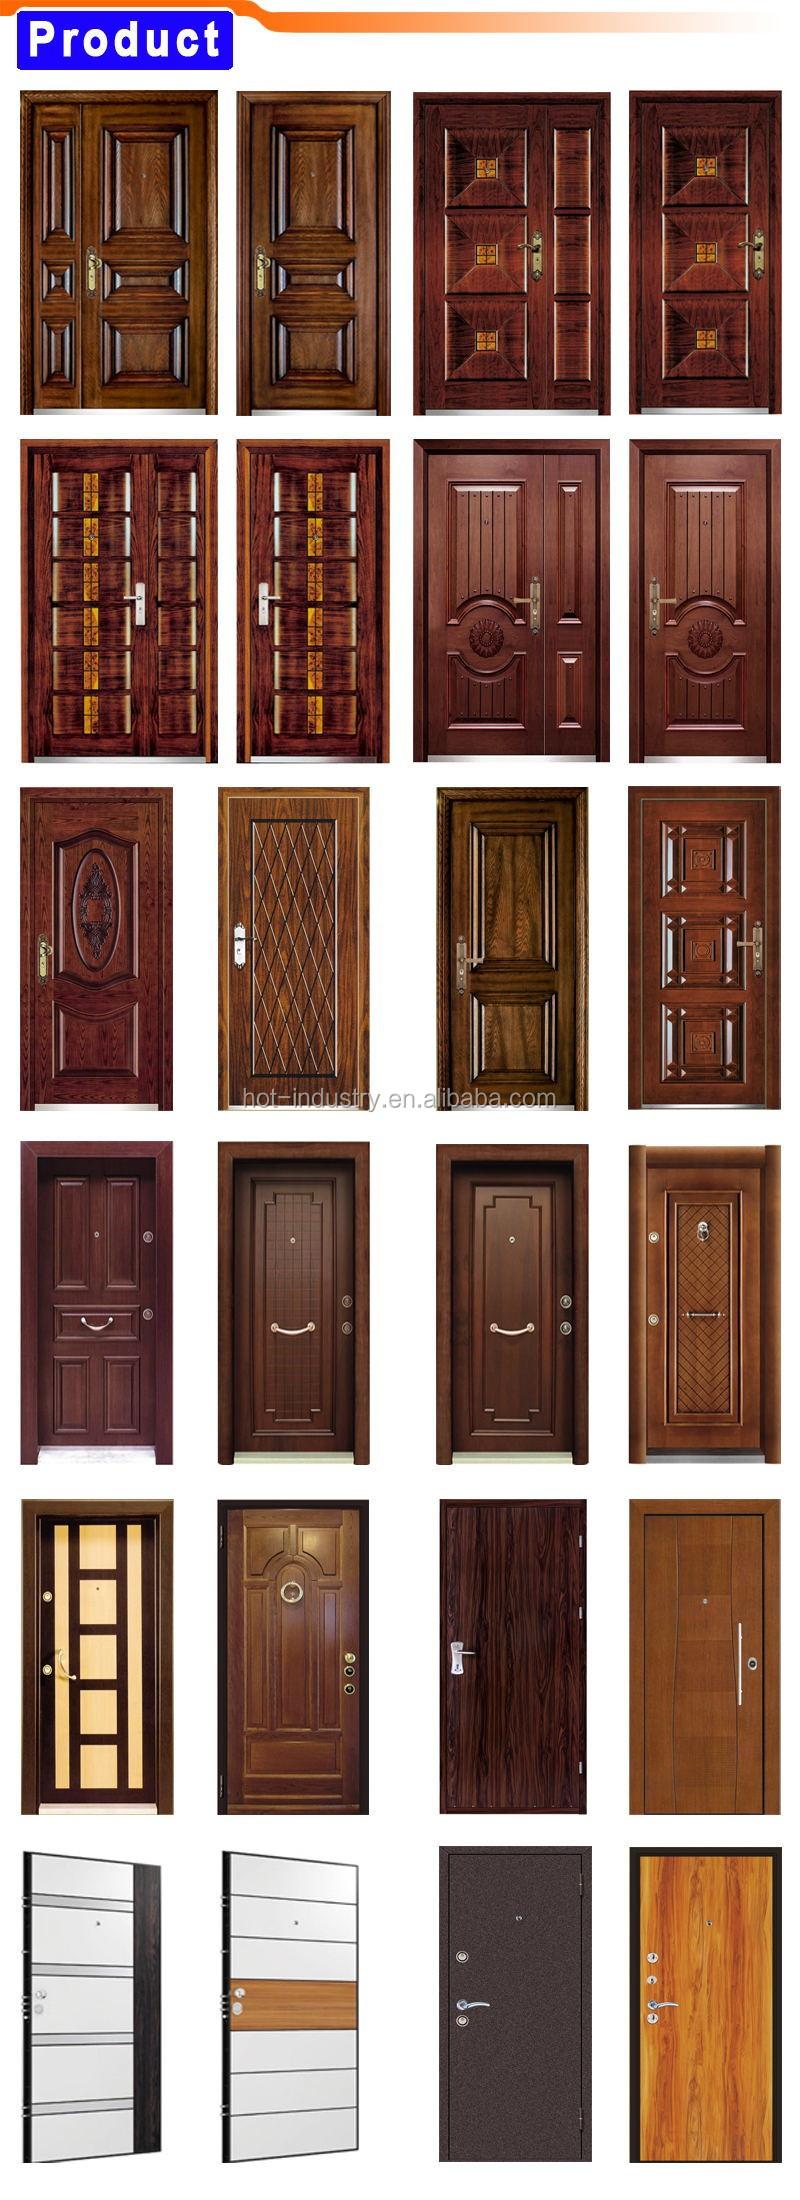 China Top Brand Steel Door Frame Making Machines High Quality Door Lock Turkey Anti Theft Turkey